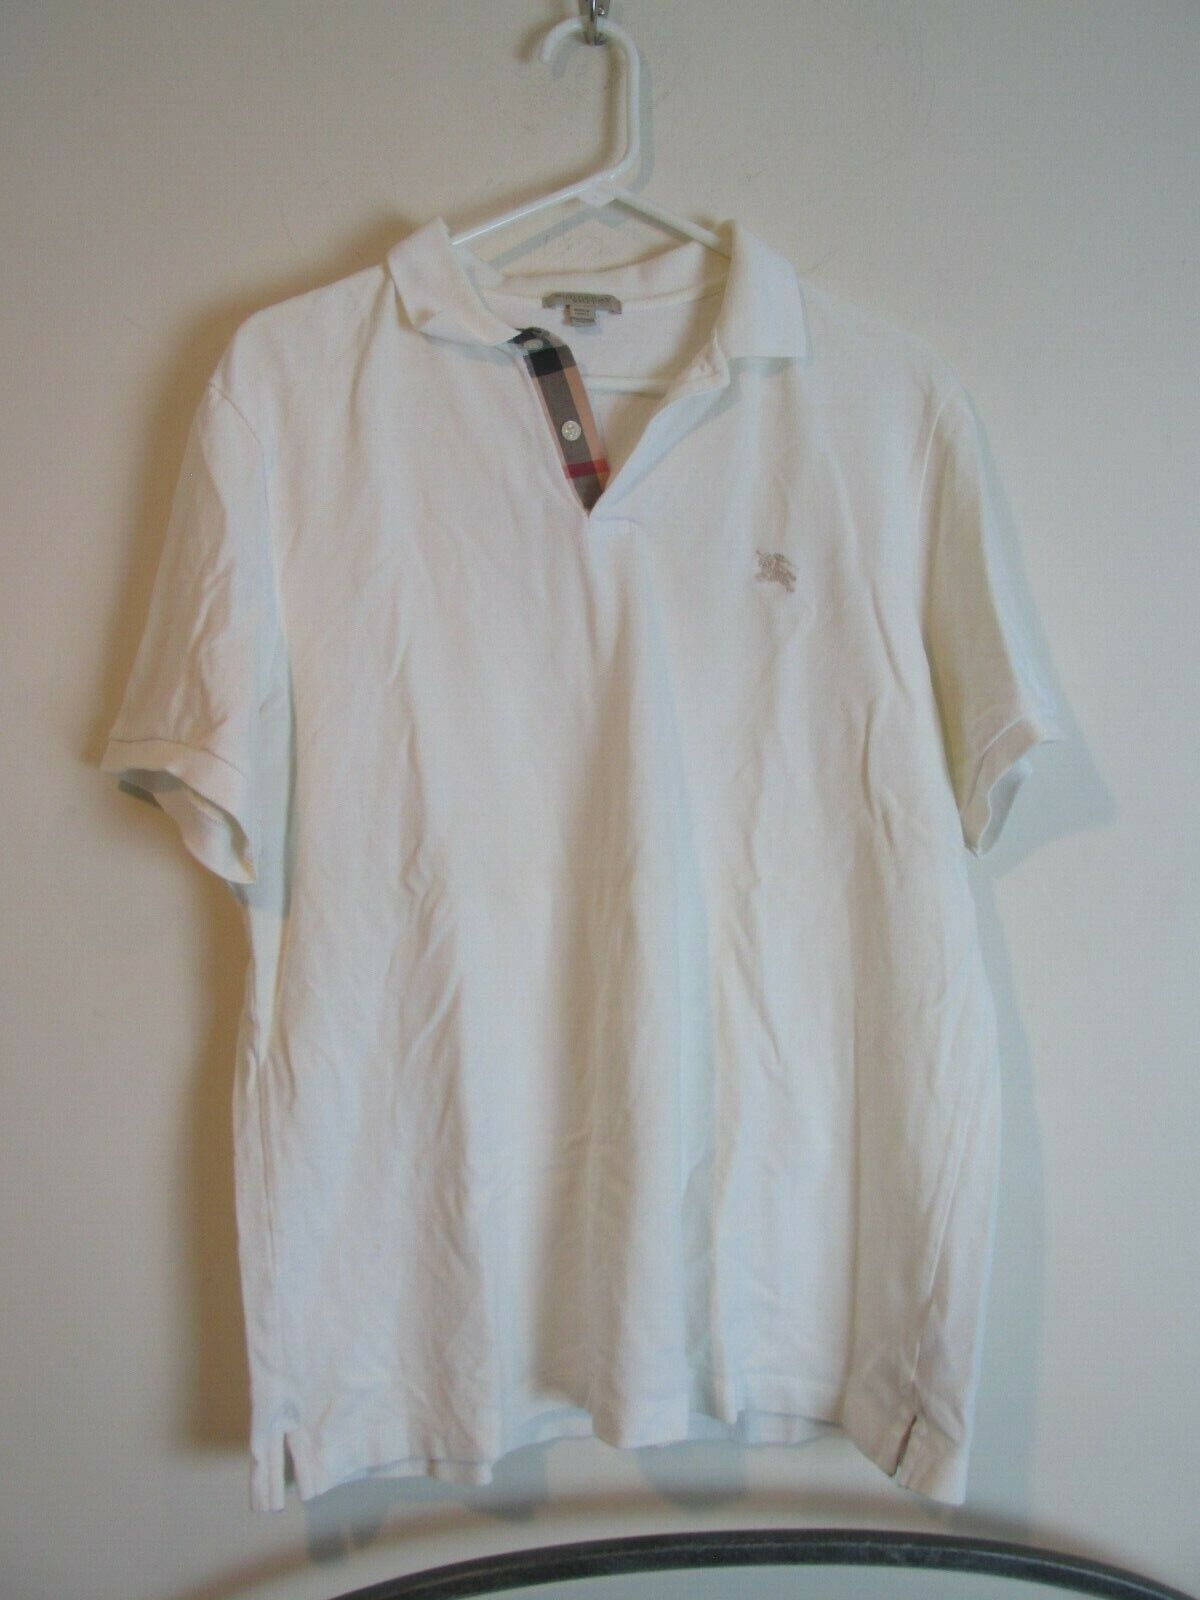 Купить Burberry - Burberry Brit Polo Shirt Men's Size XXL White Nova